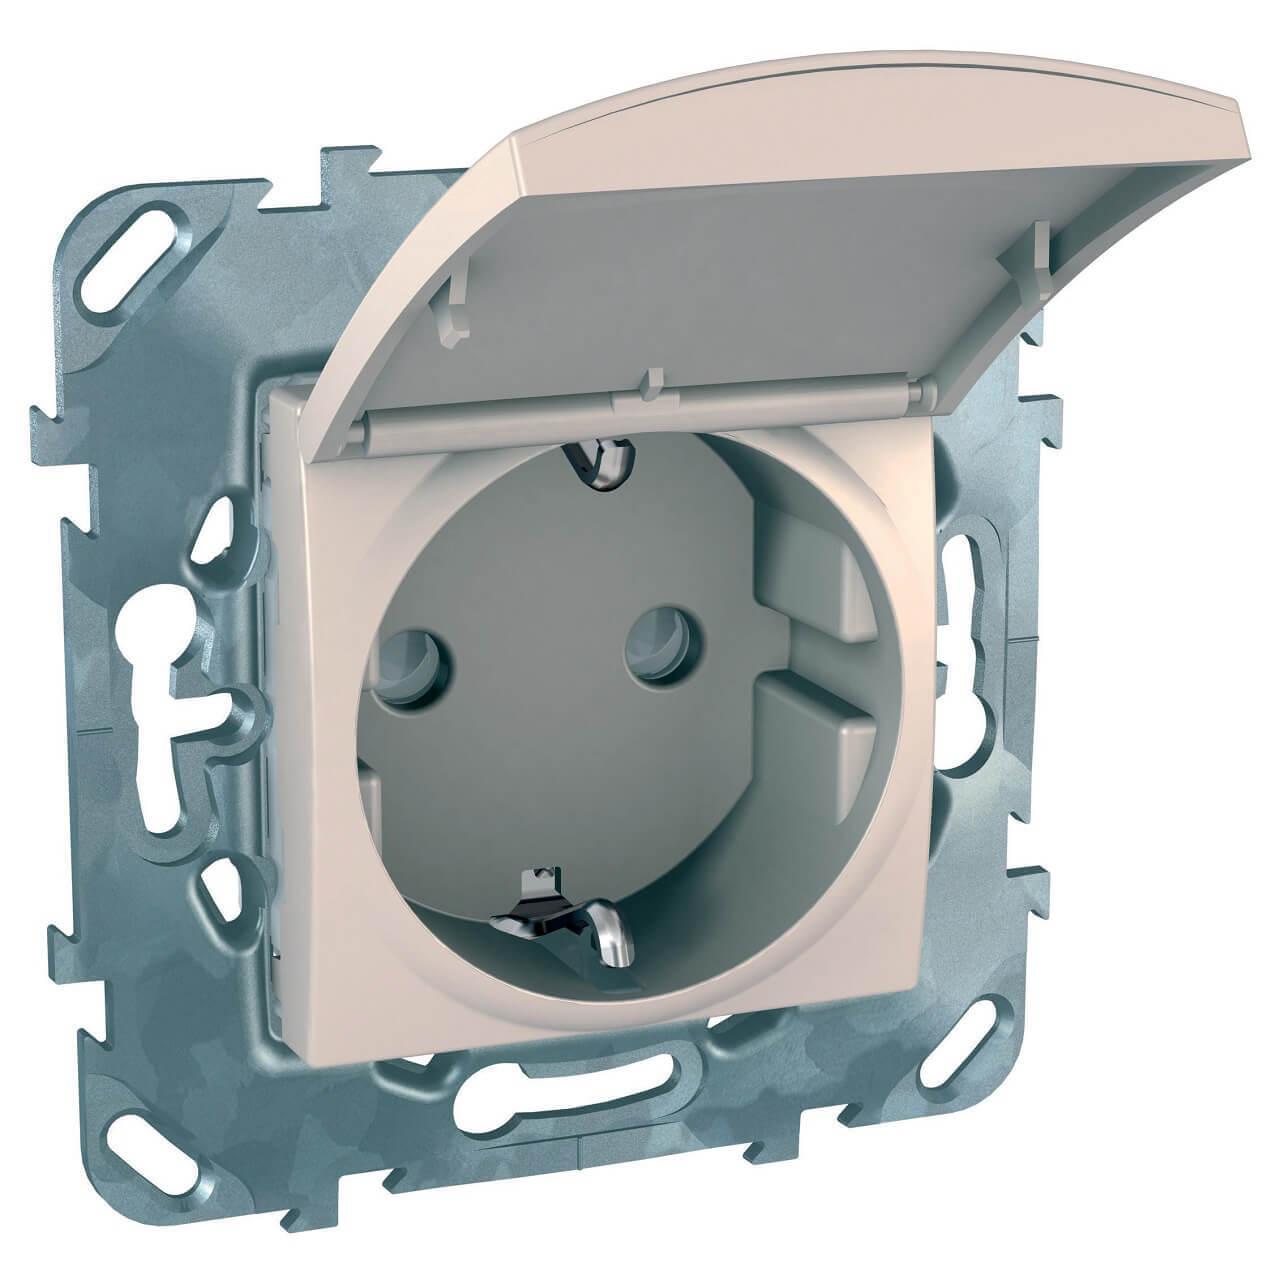 Розетка Schneider Electric Unica с/з со шторкамии крышкой 16A 250V MGU5.037.25TAZD